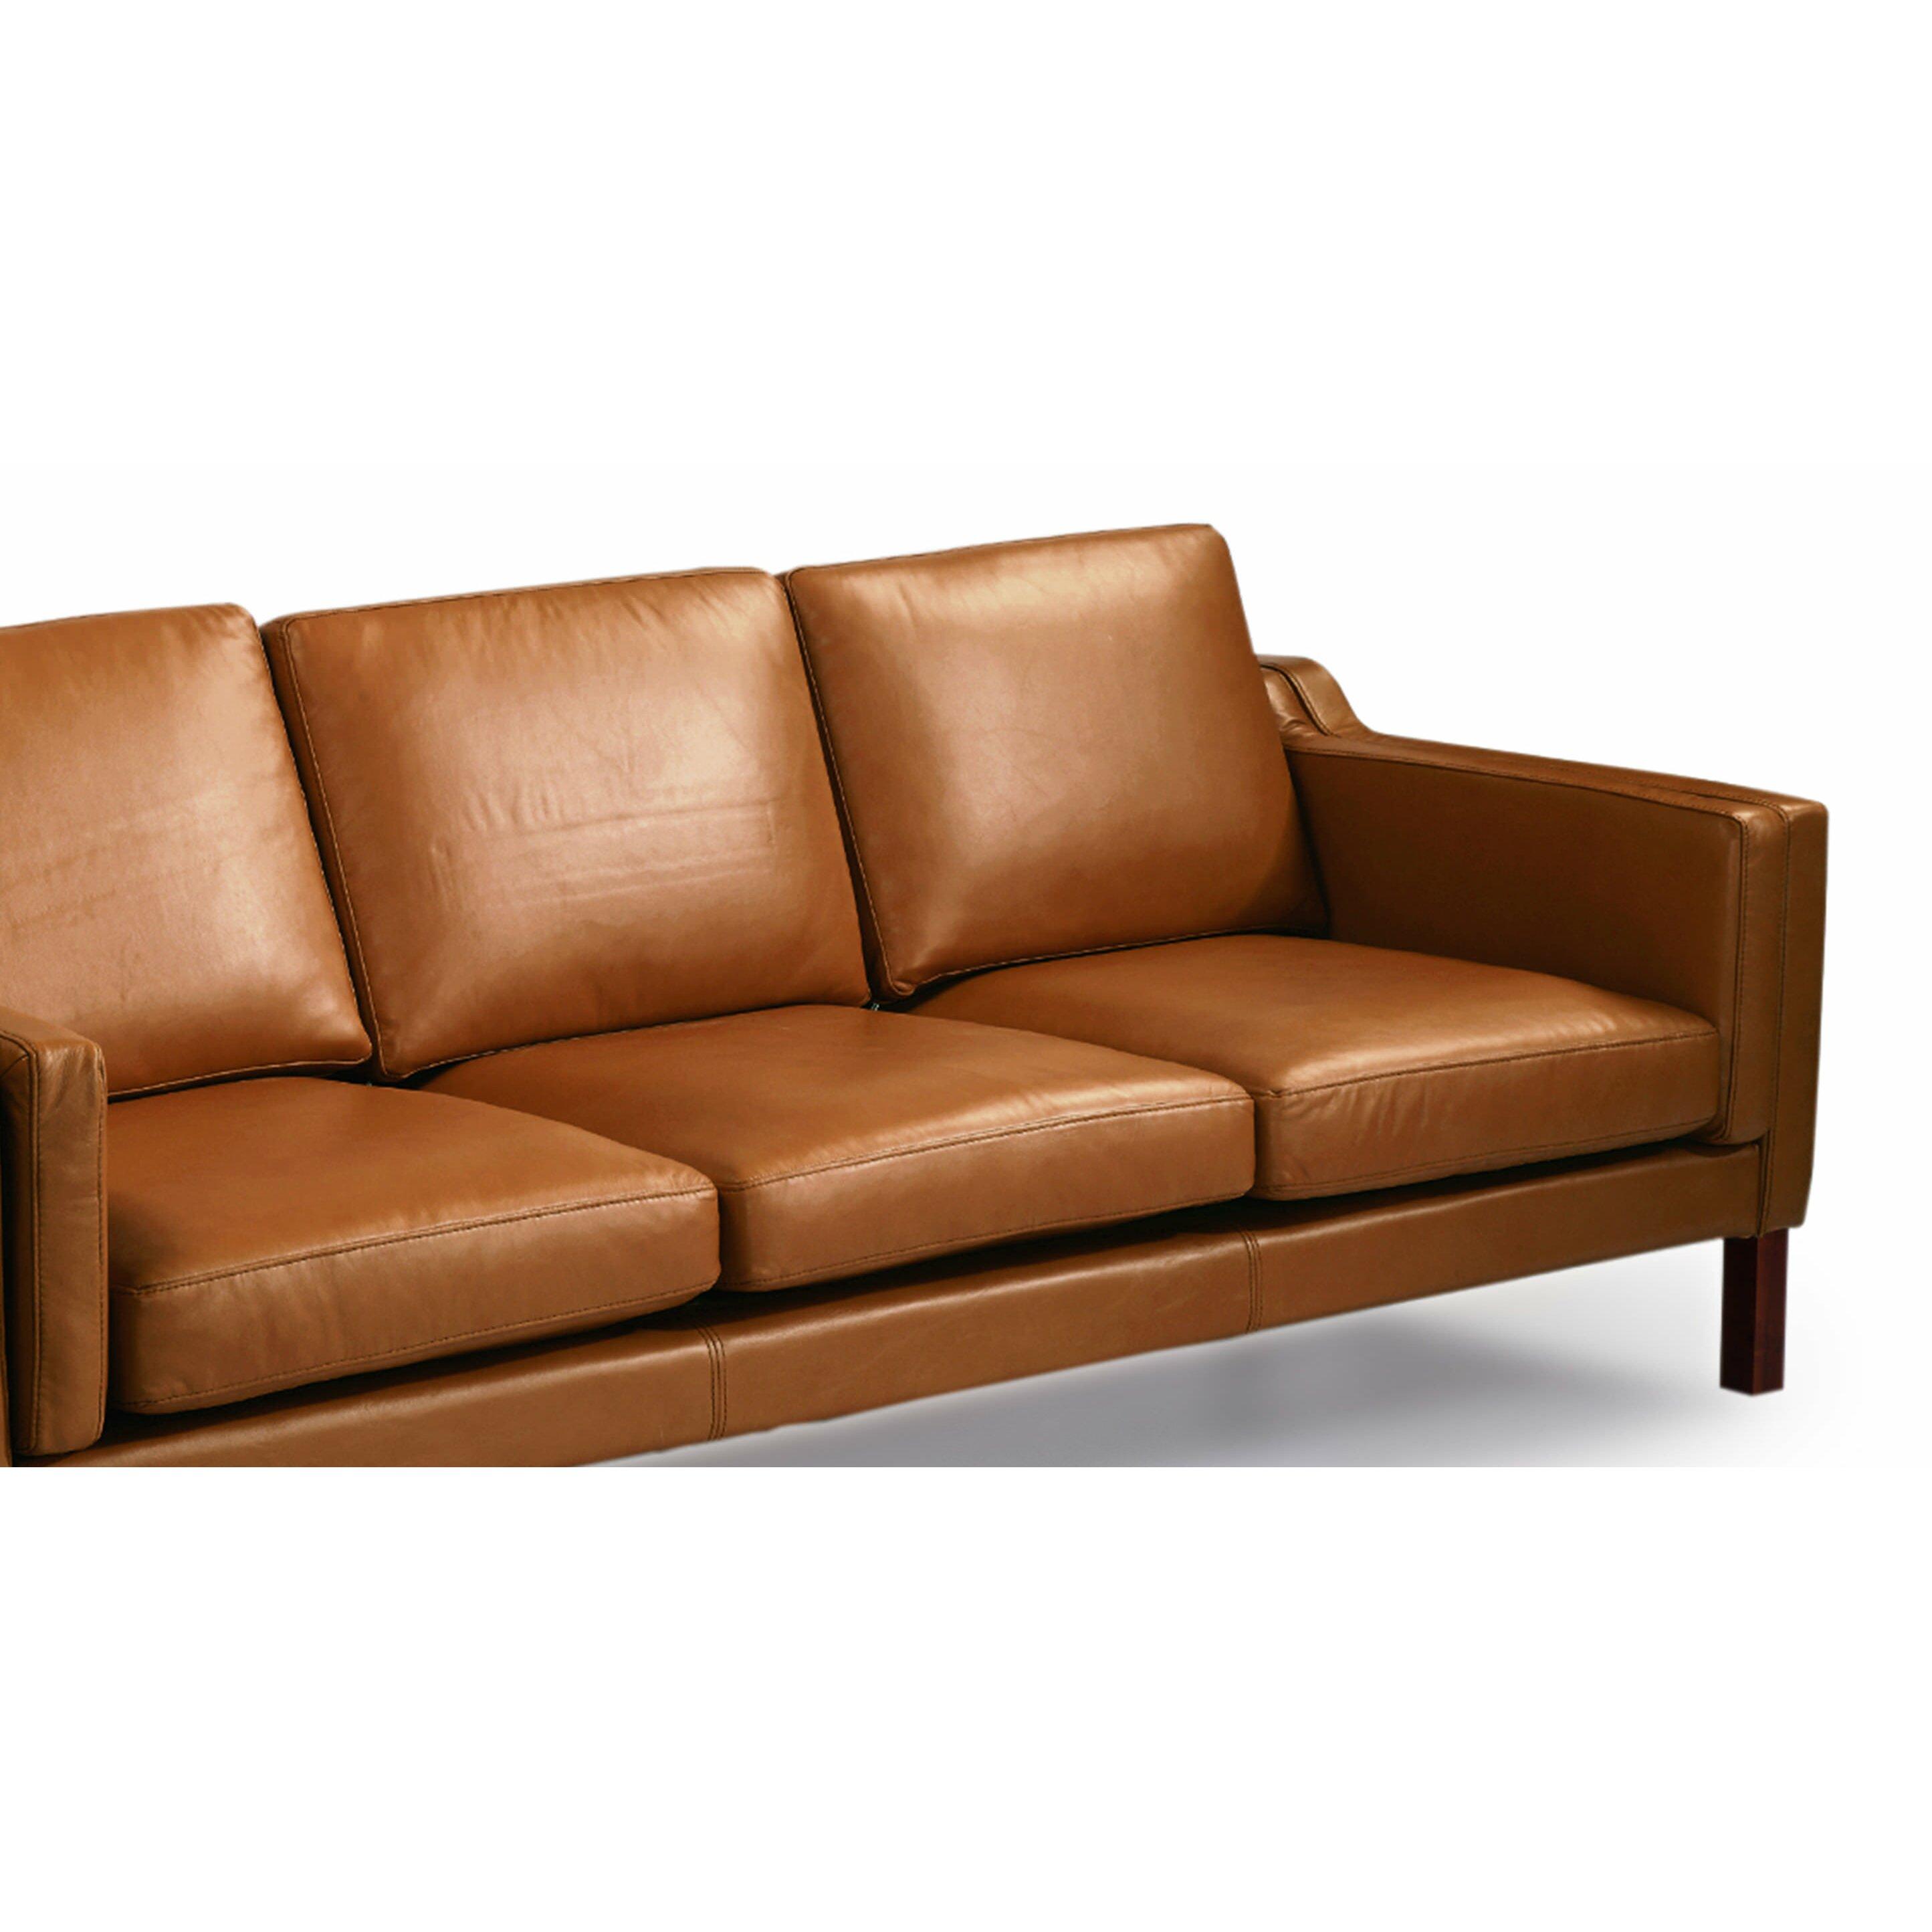 Mid Century Modern Sofas: Monroe Mid Century Modern Leather Sofa